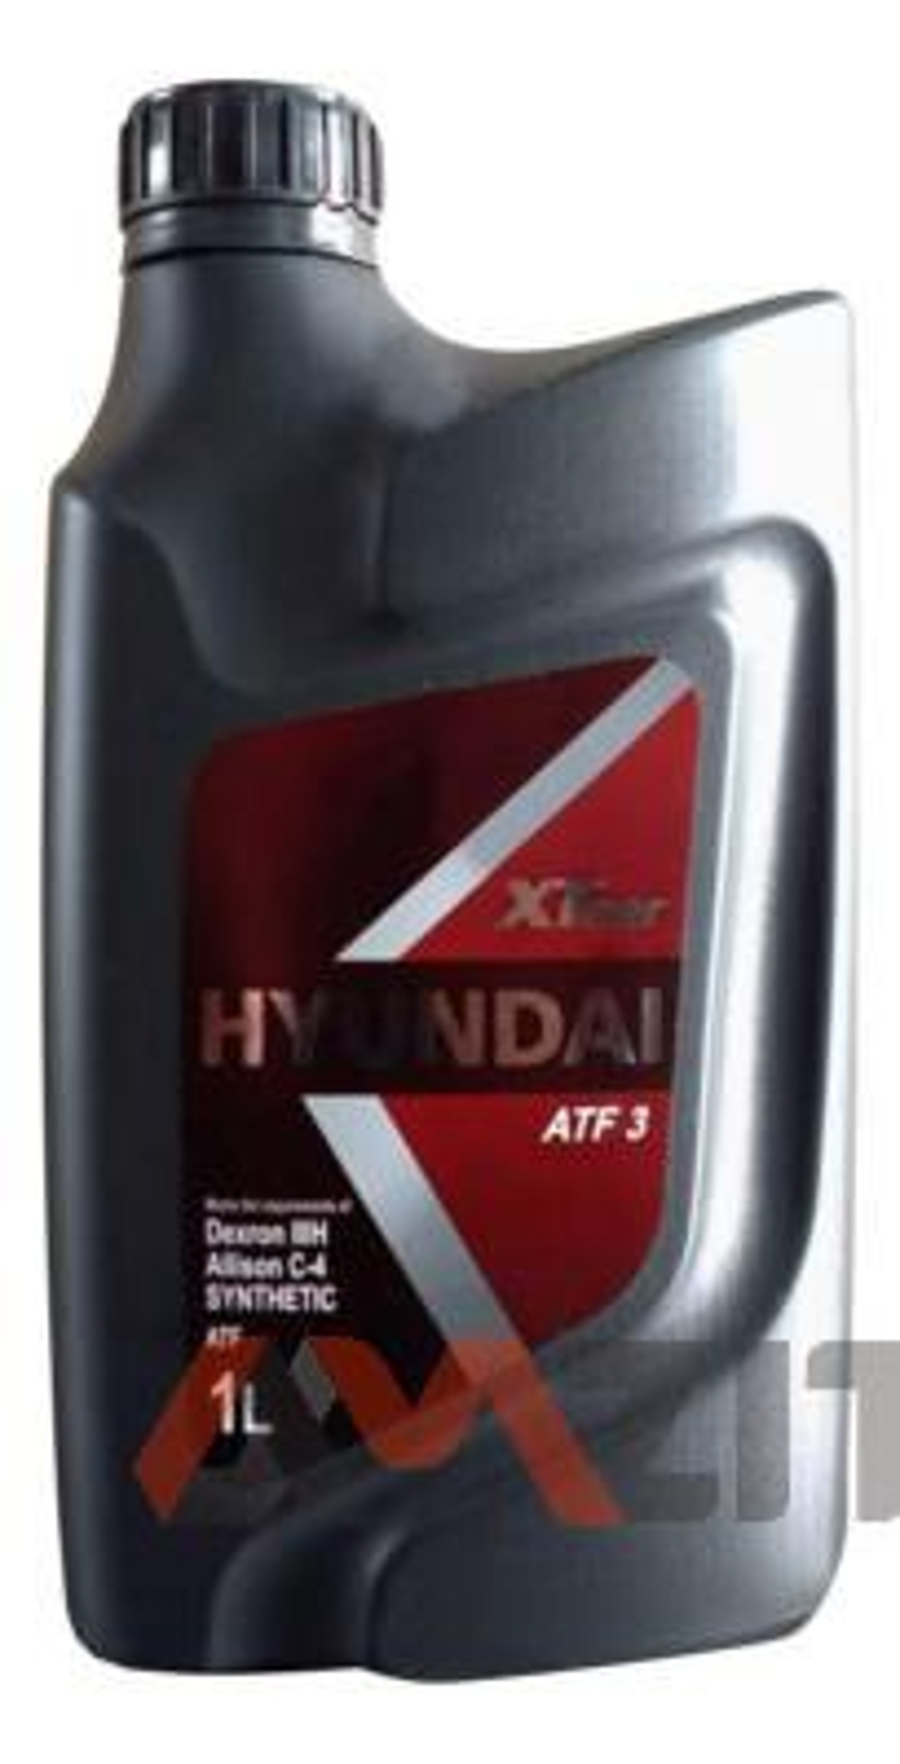 HYUNDAI XTeer ATF 3